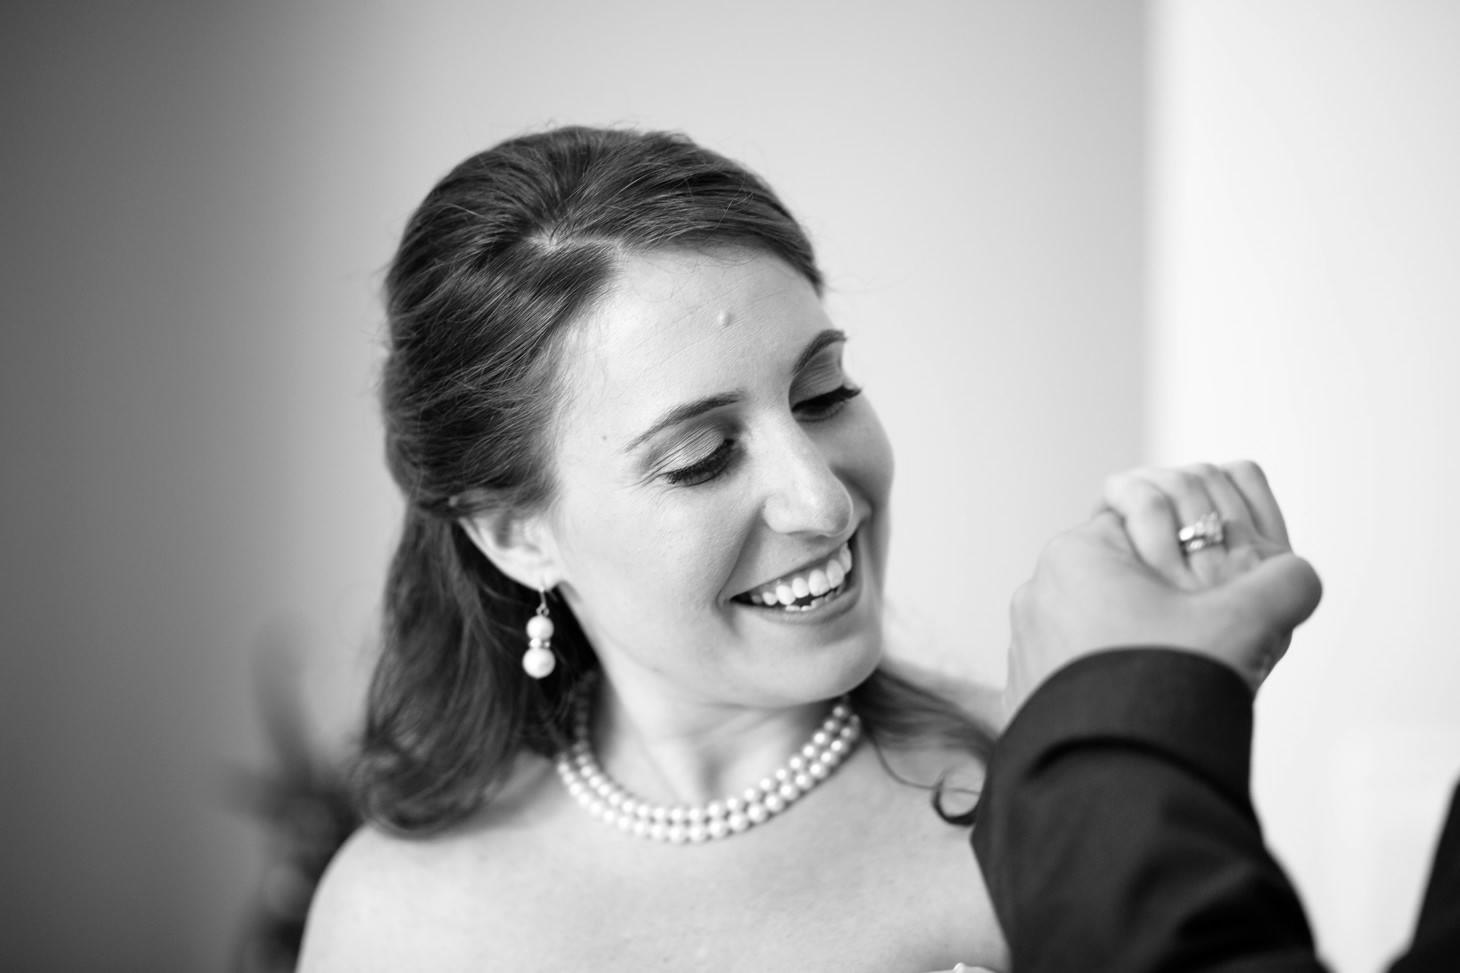 050-nyc-wedding-photographer-hoboken-waterfront-wedding-photos-smitten-chickens.jpg